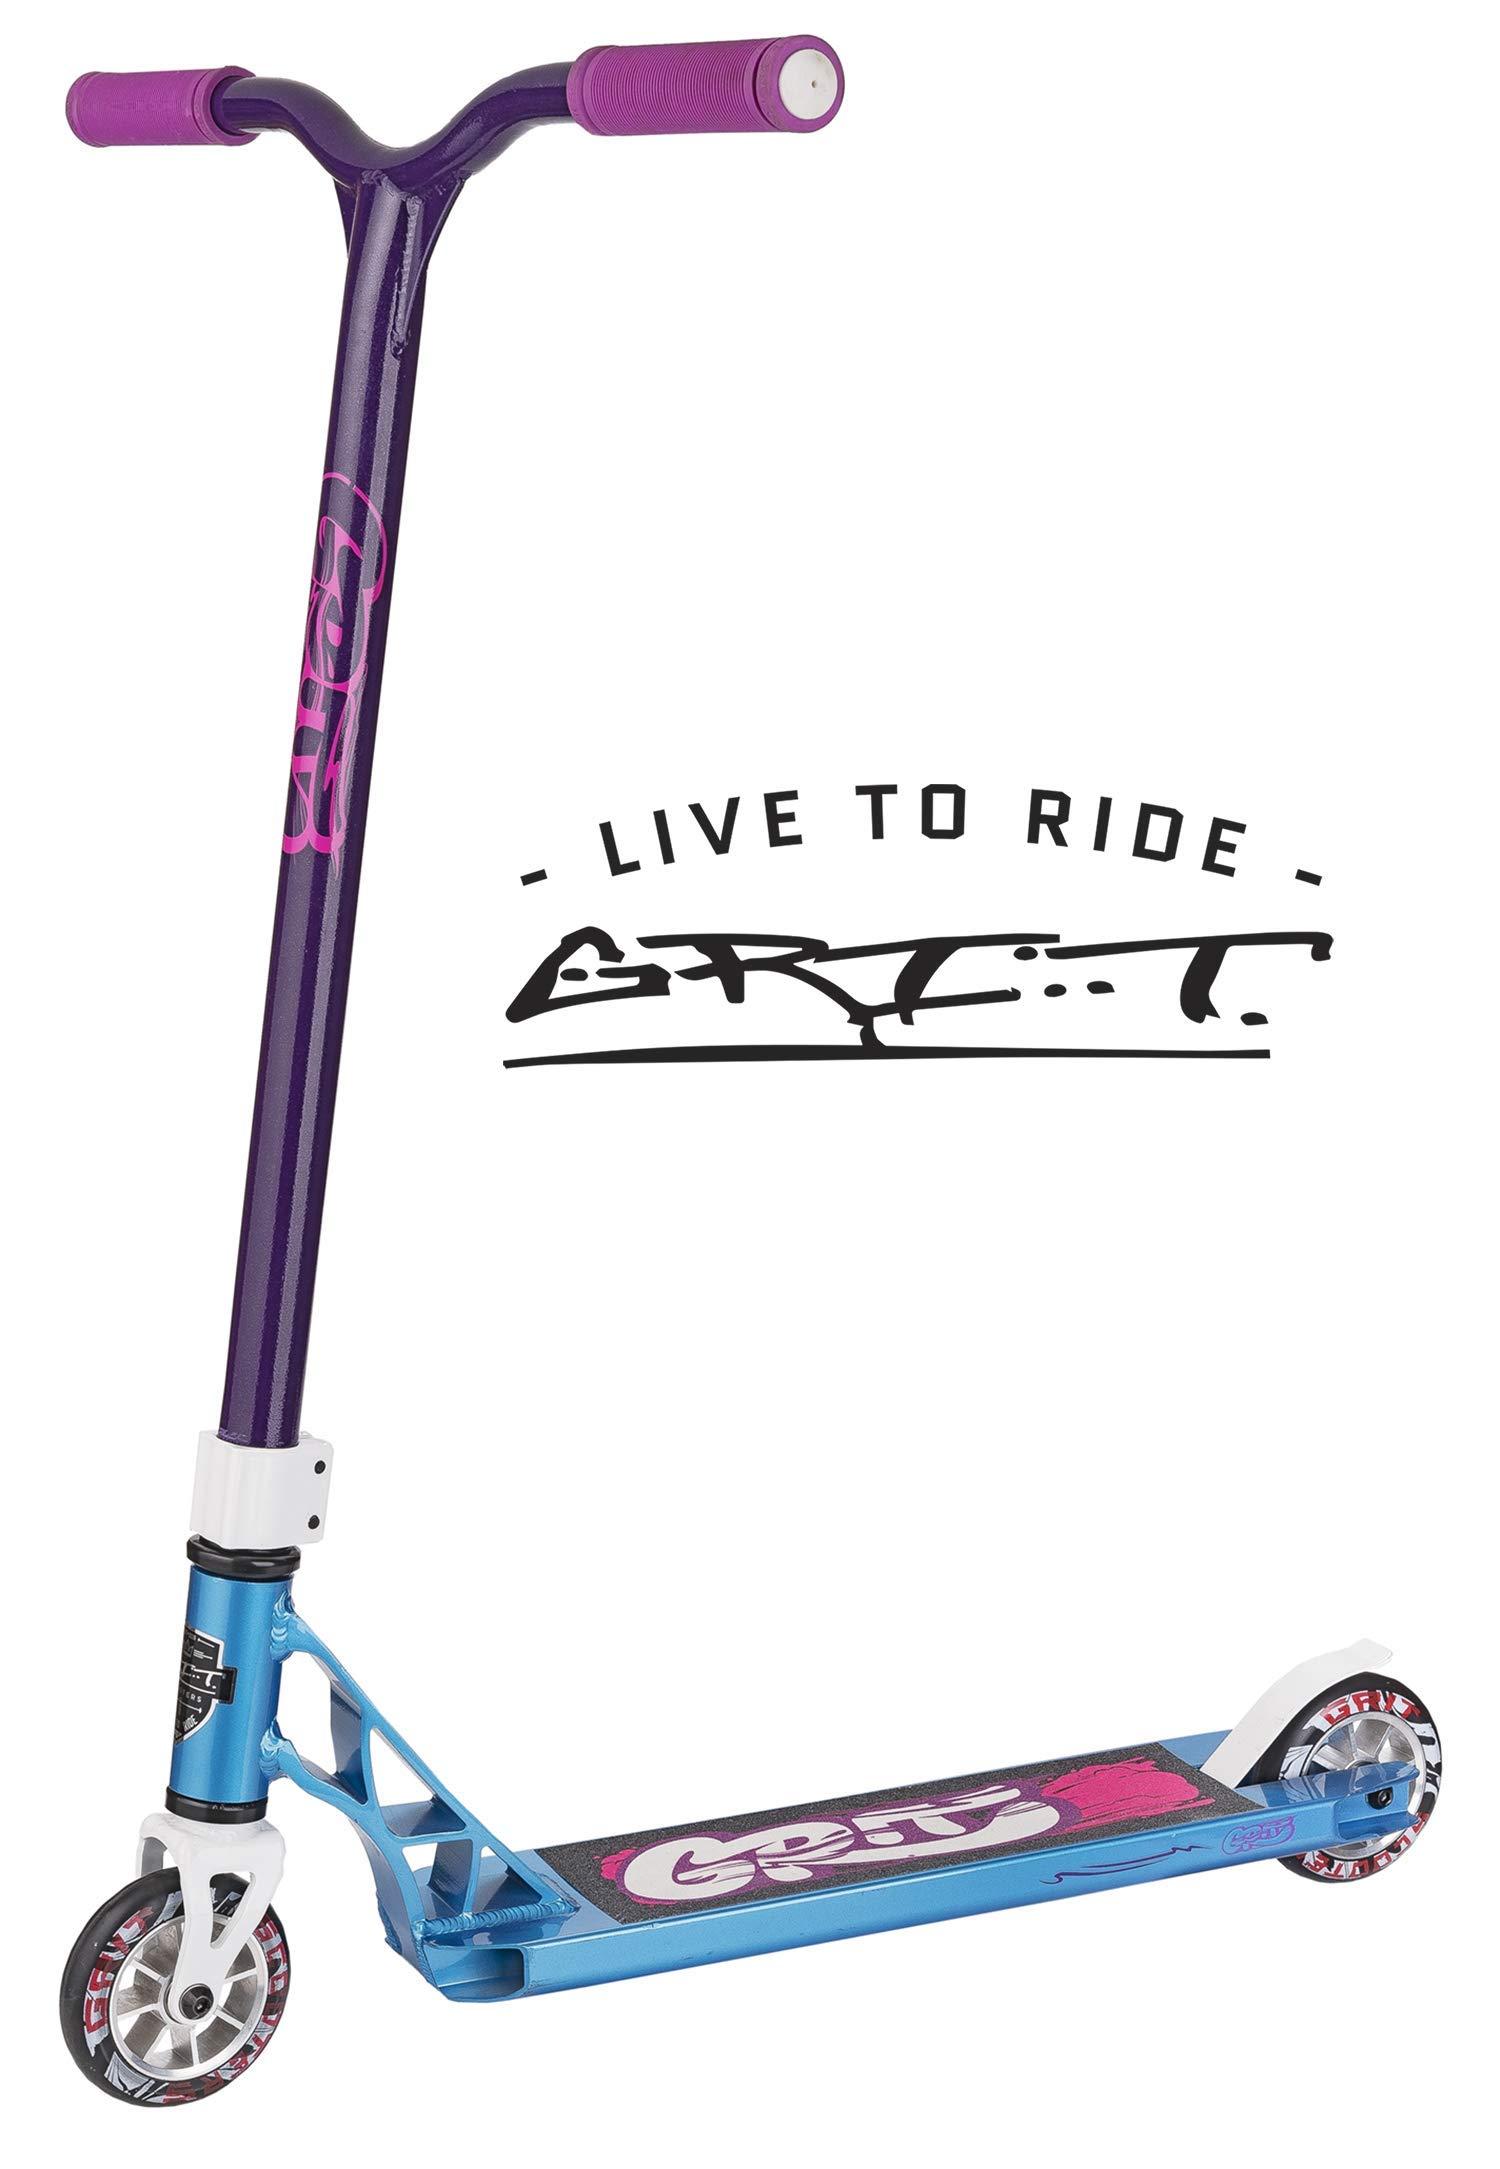 Grit Fluxx Pro Scooter (Satin Iced Blue/Purple)